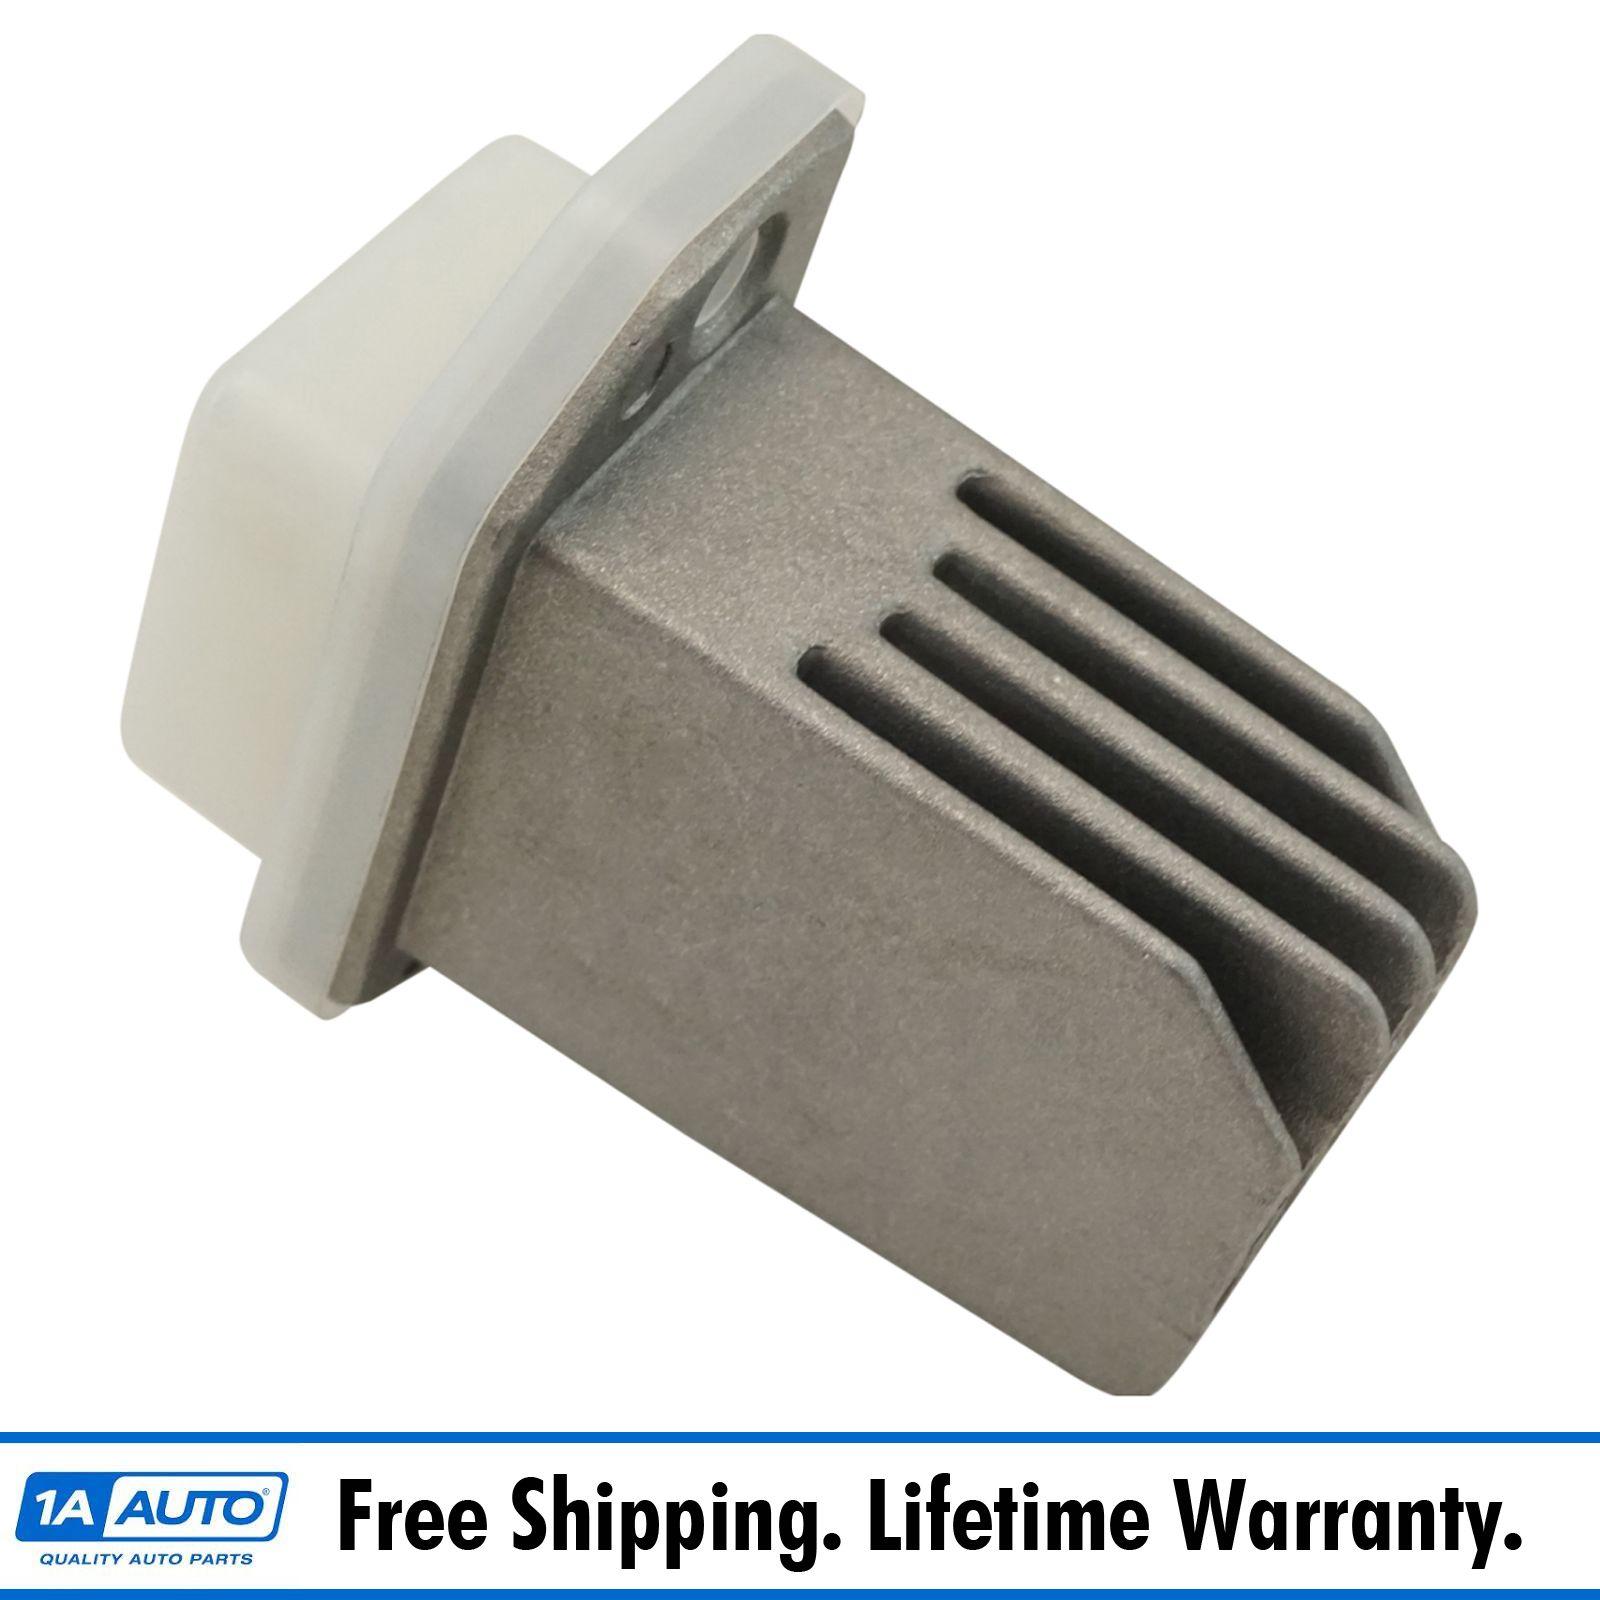 Details about Heater Blower Motor Resistor Controller for NV1500 NV2500  NV3500 Rogue Sentra